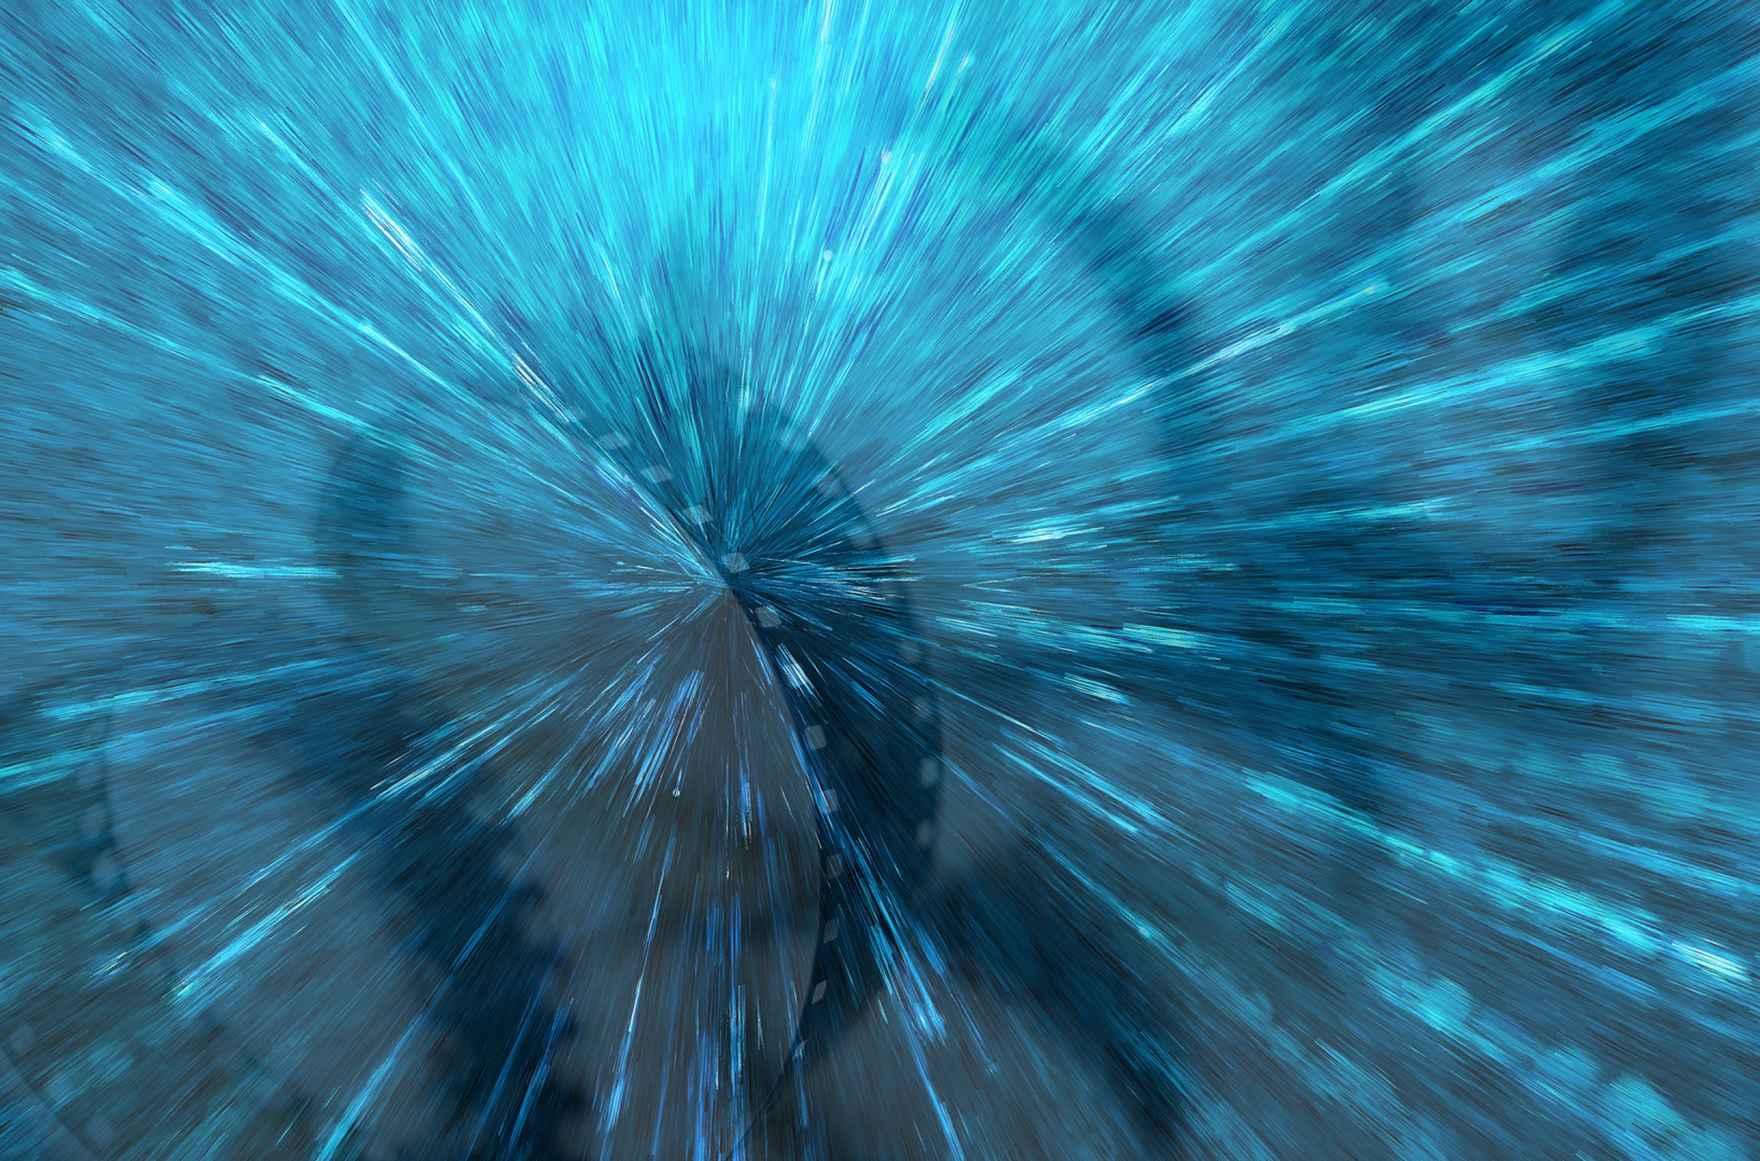 teal-matrix-unleash-film-strip